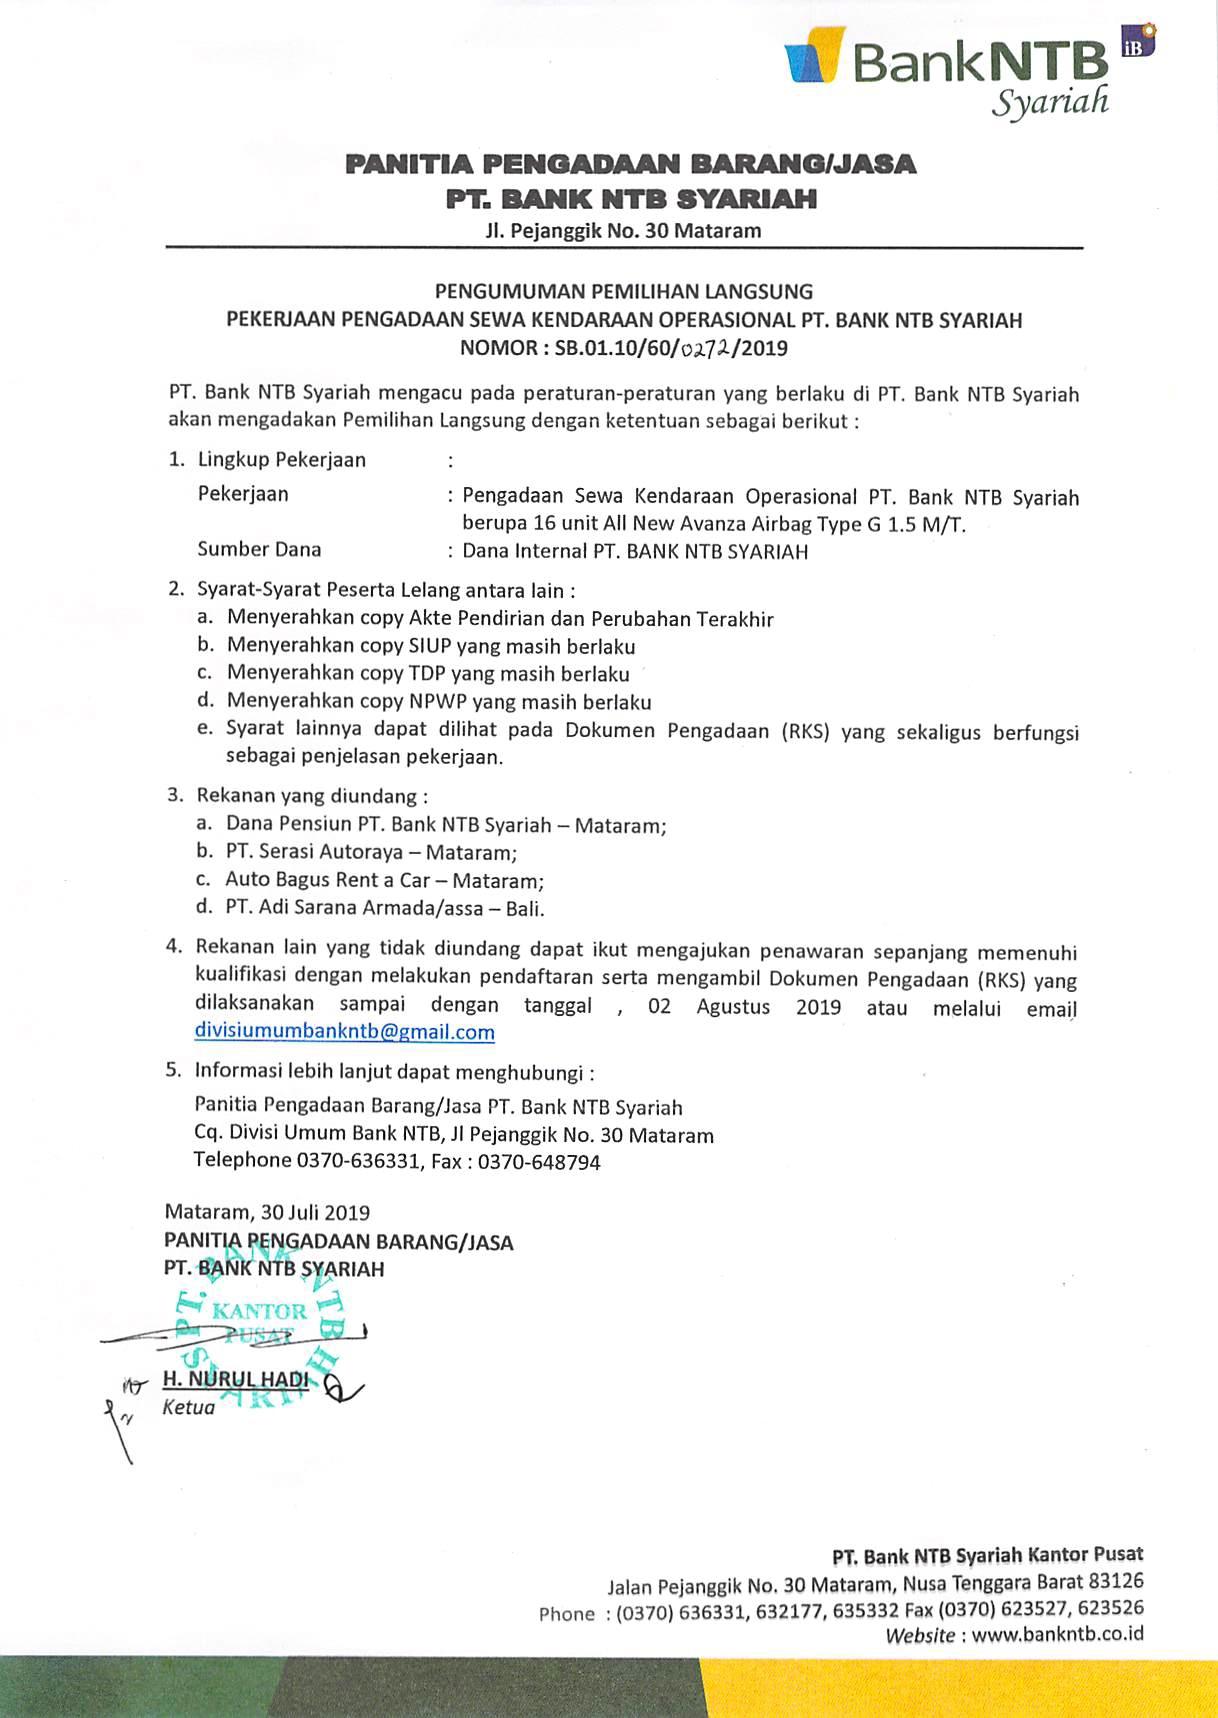 Lelang-Pengadaan-Sewa-Kendaraan-Operasional-PT-Bank-NTB-Syariah-Th-2019